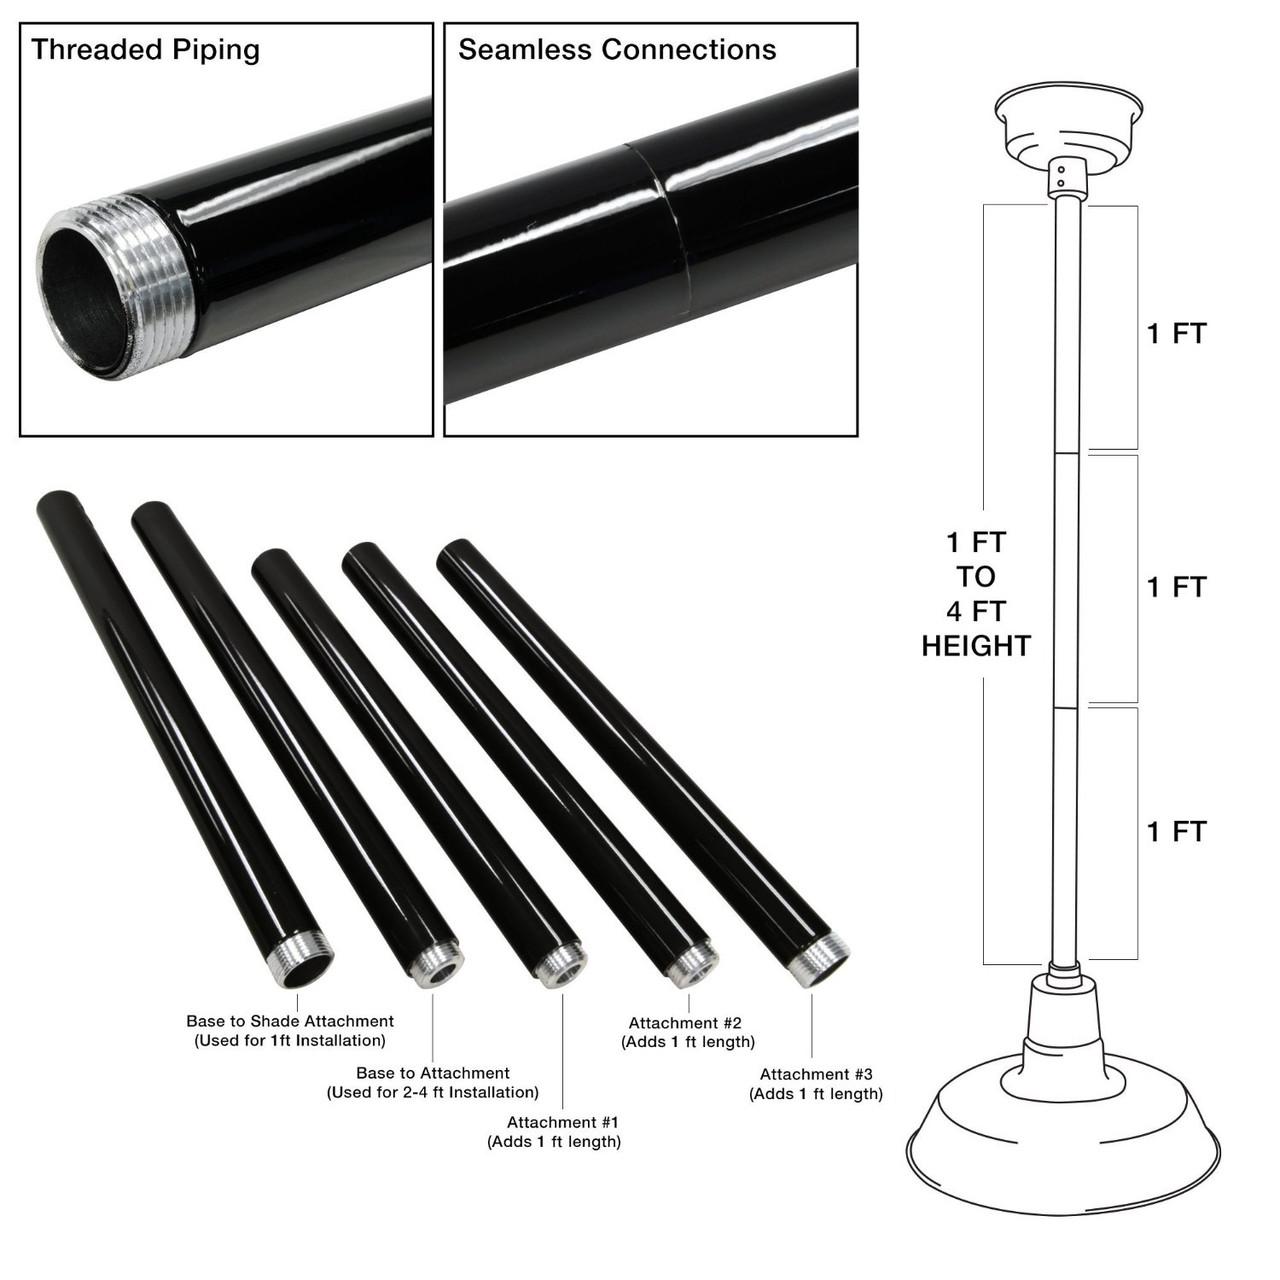 Customizable Peony Indoor Led Barn Pendant Light G24 Wiring Diagram 1 Ft To 4 Height Adjustment Bars